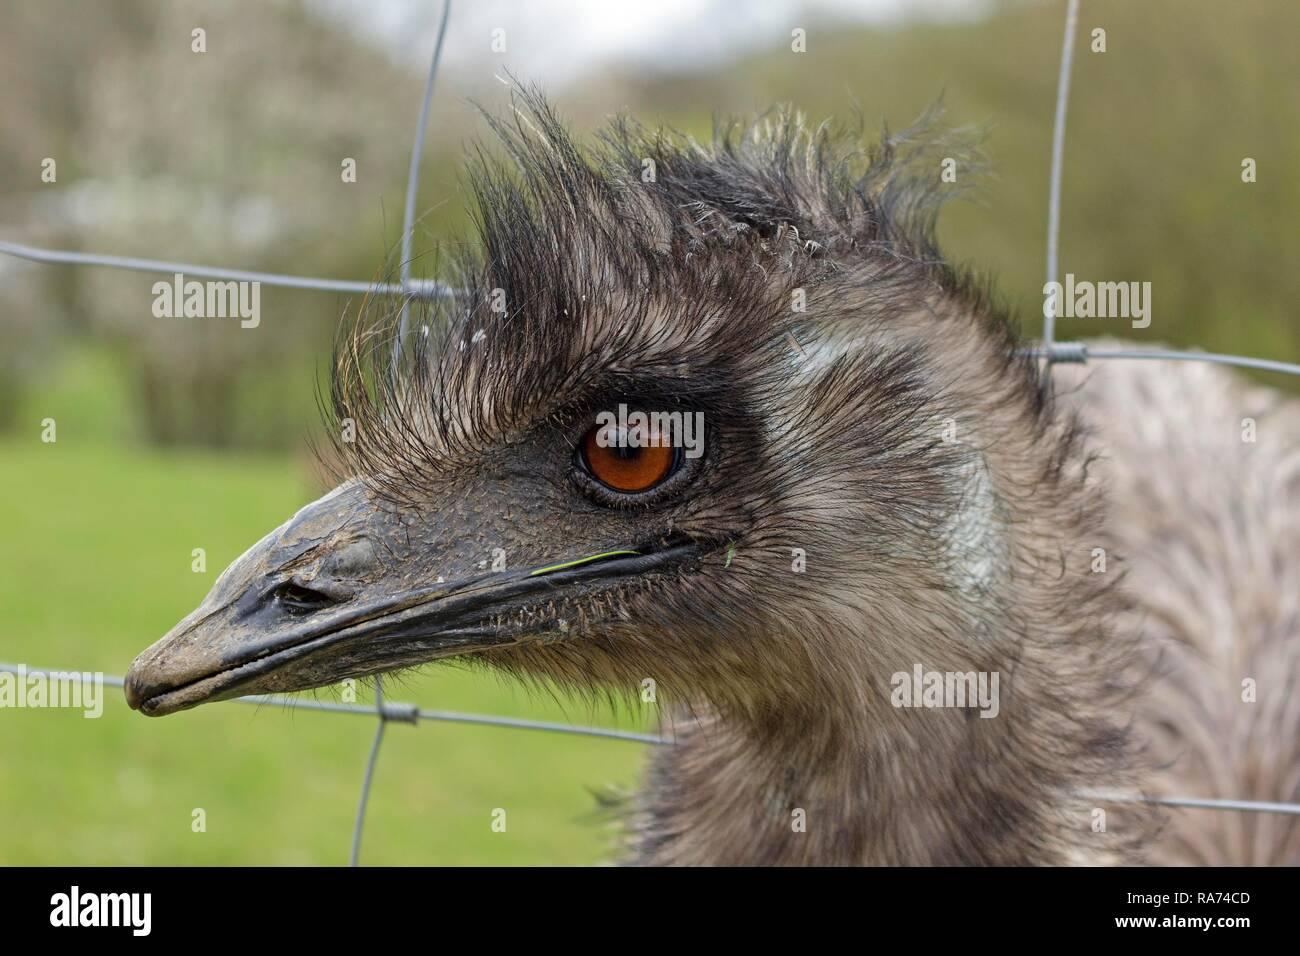 Emu (Dromaius novaehollandiae) looking through wire fence, Wolpersdorf, Sauerland, North Rhine-Westphalia, Germany - Stock Image